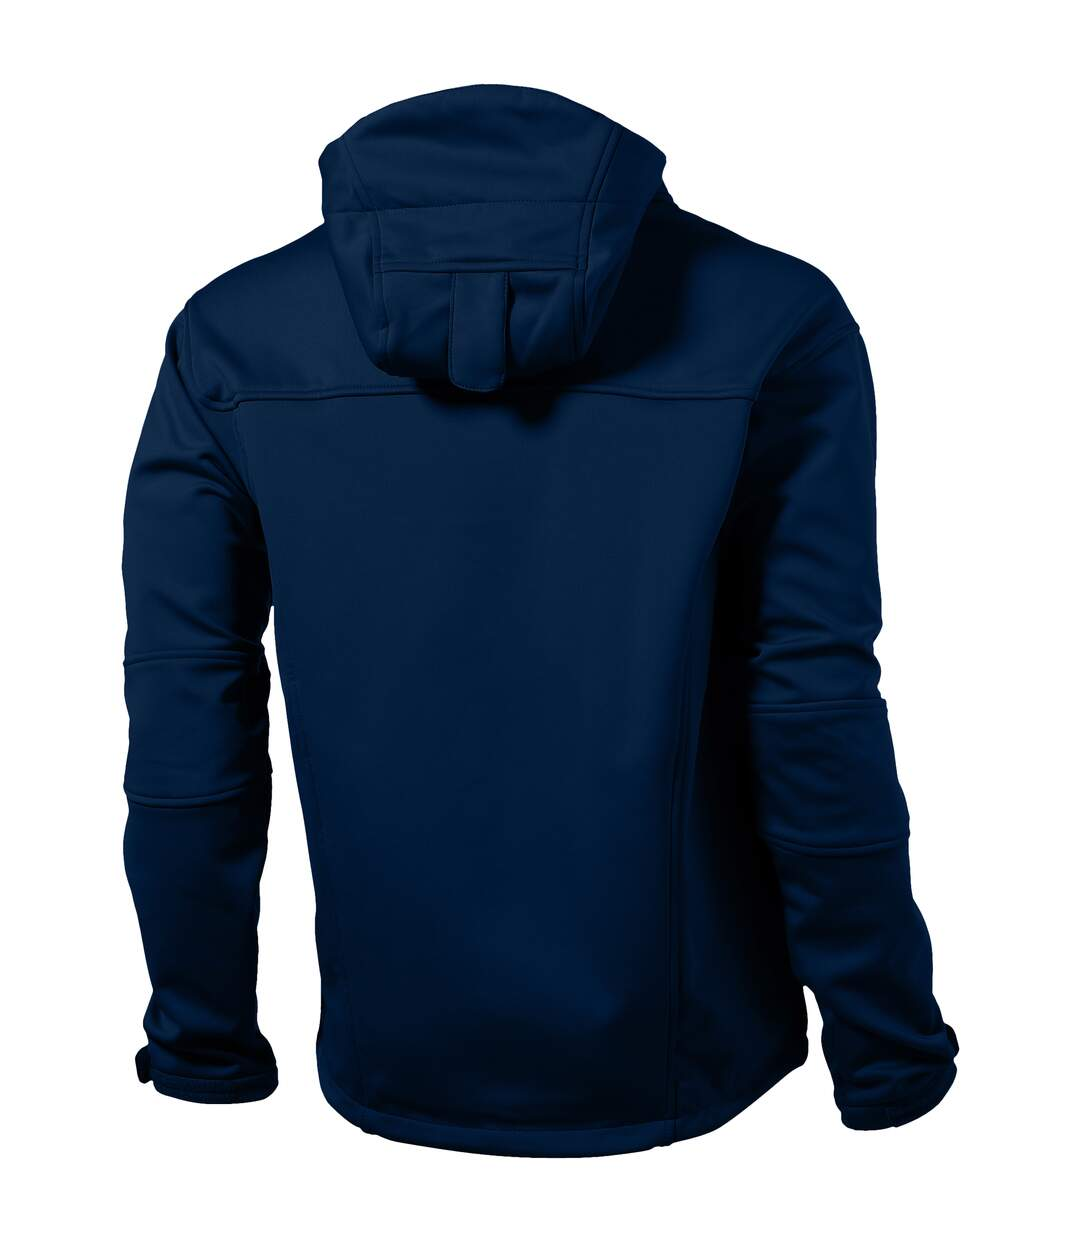 Slazenger - Veste Softshell Match - Homme (Bleu marine) - UTPF1771